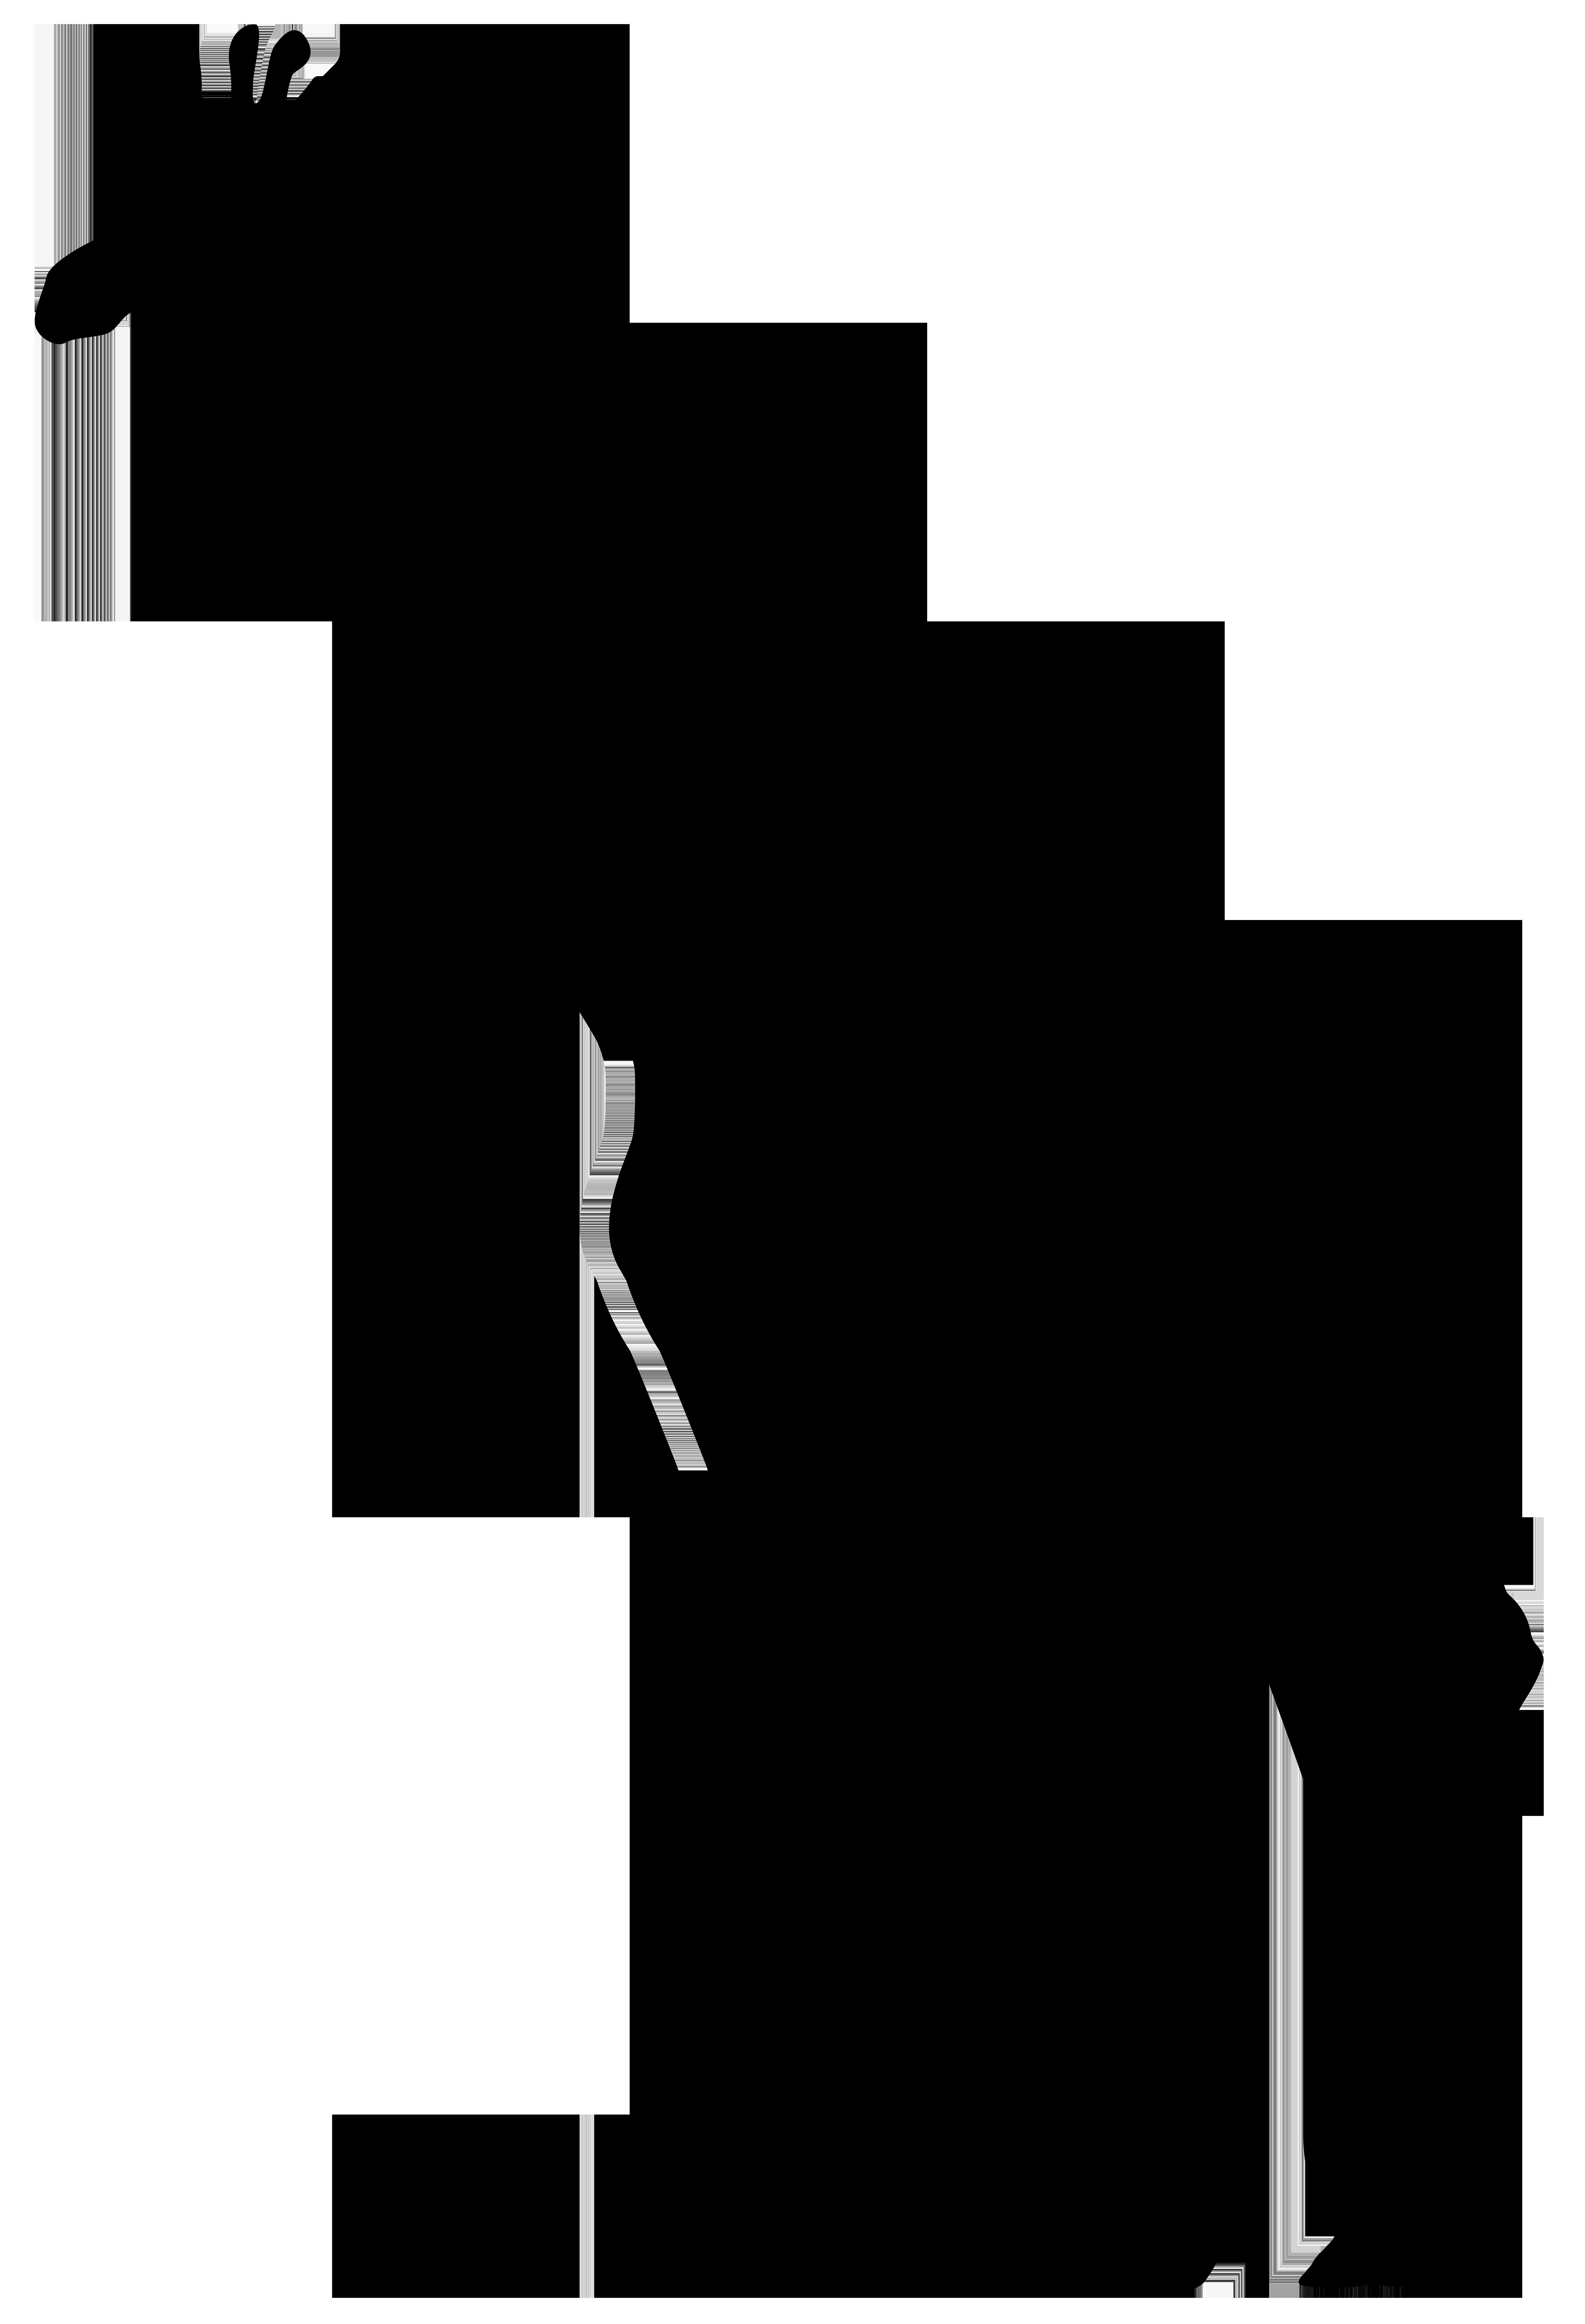 Giraffe png transparent clip. Hunter clipart silhouette